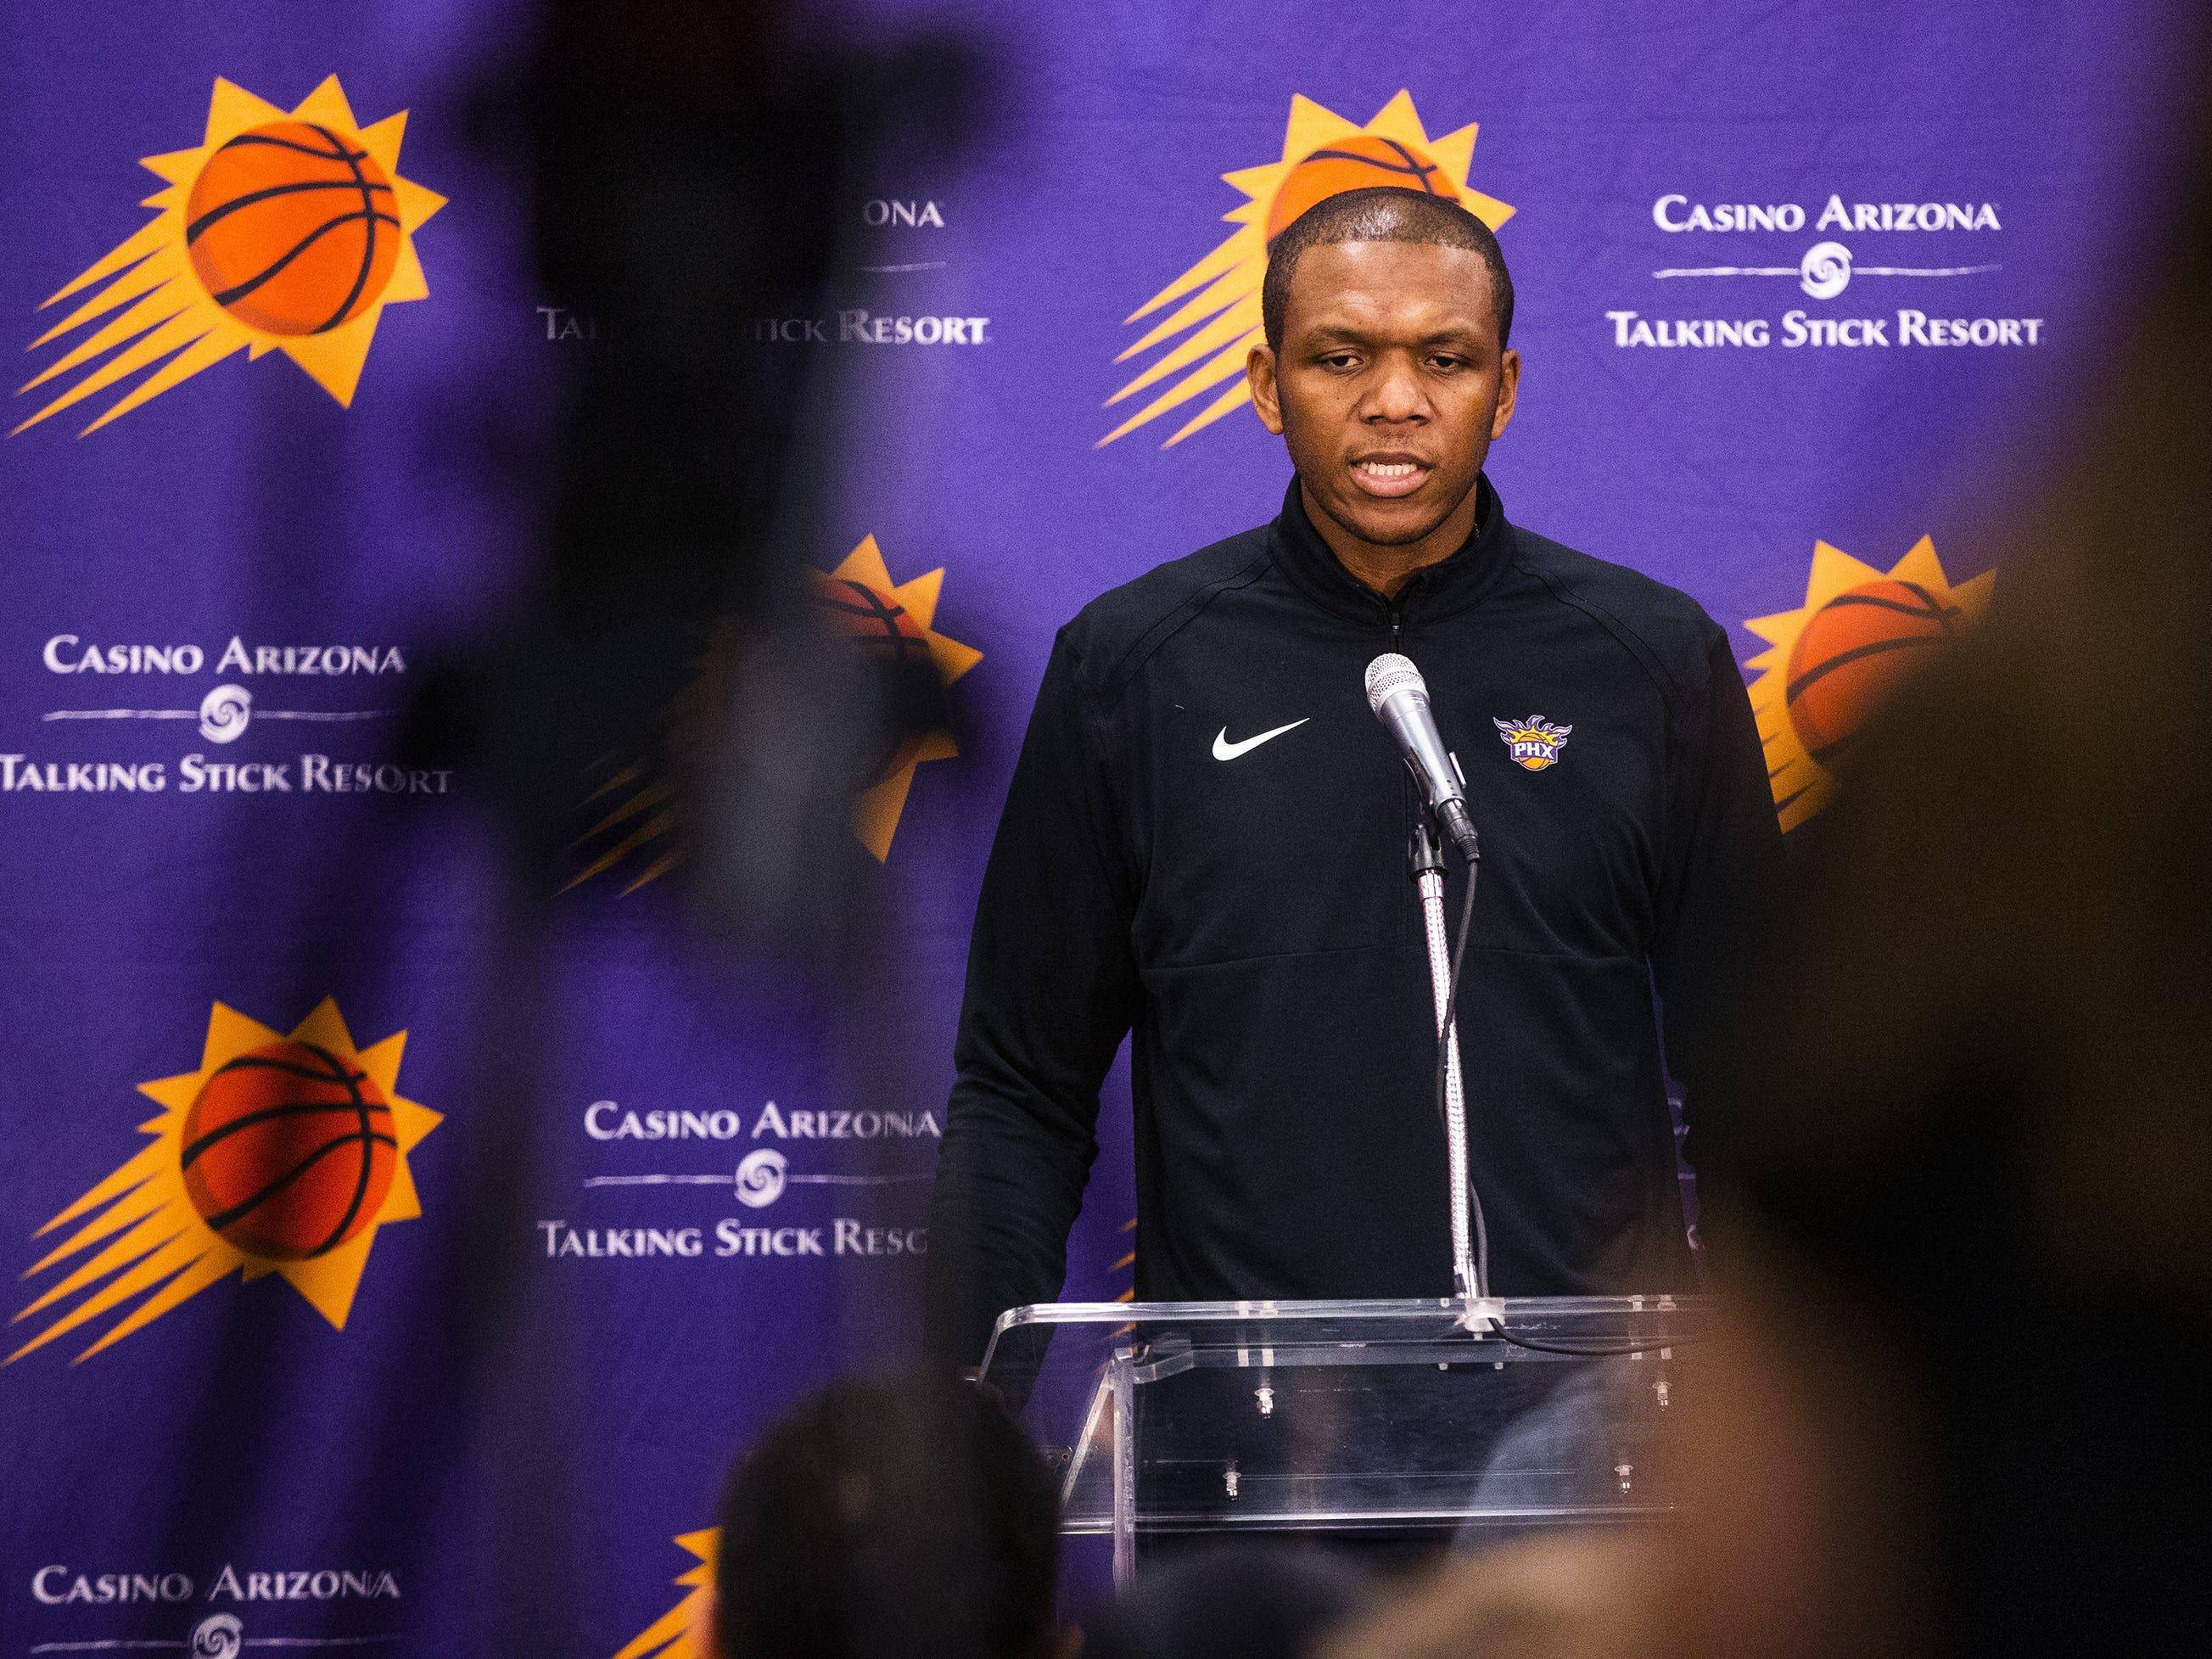 James Jones discusses the decision to fire coach Igor Kokoskov after just one season.